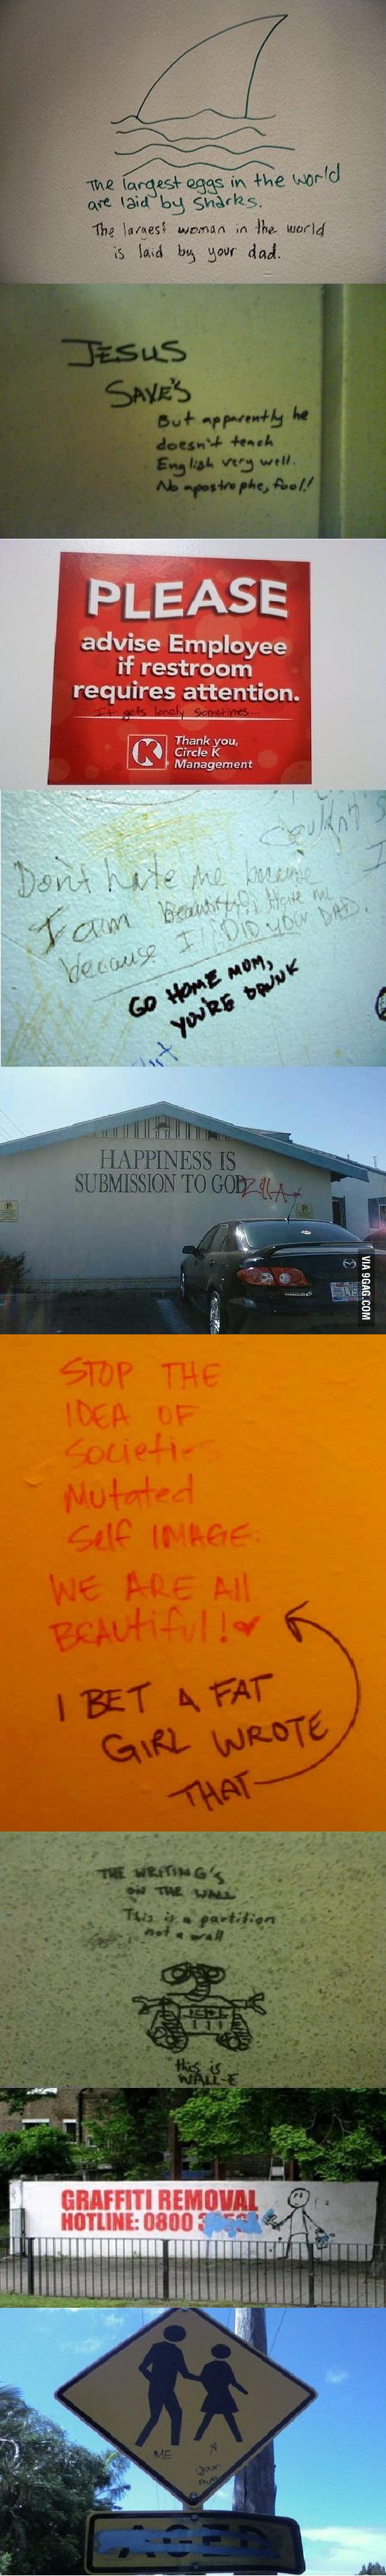 Vandalism at its finest